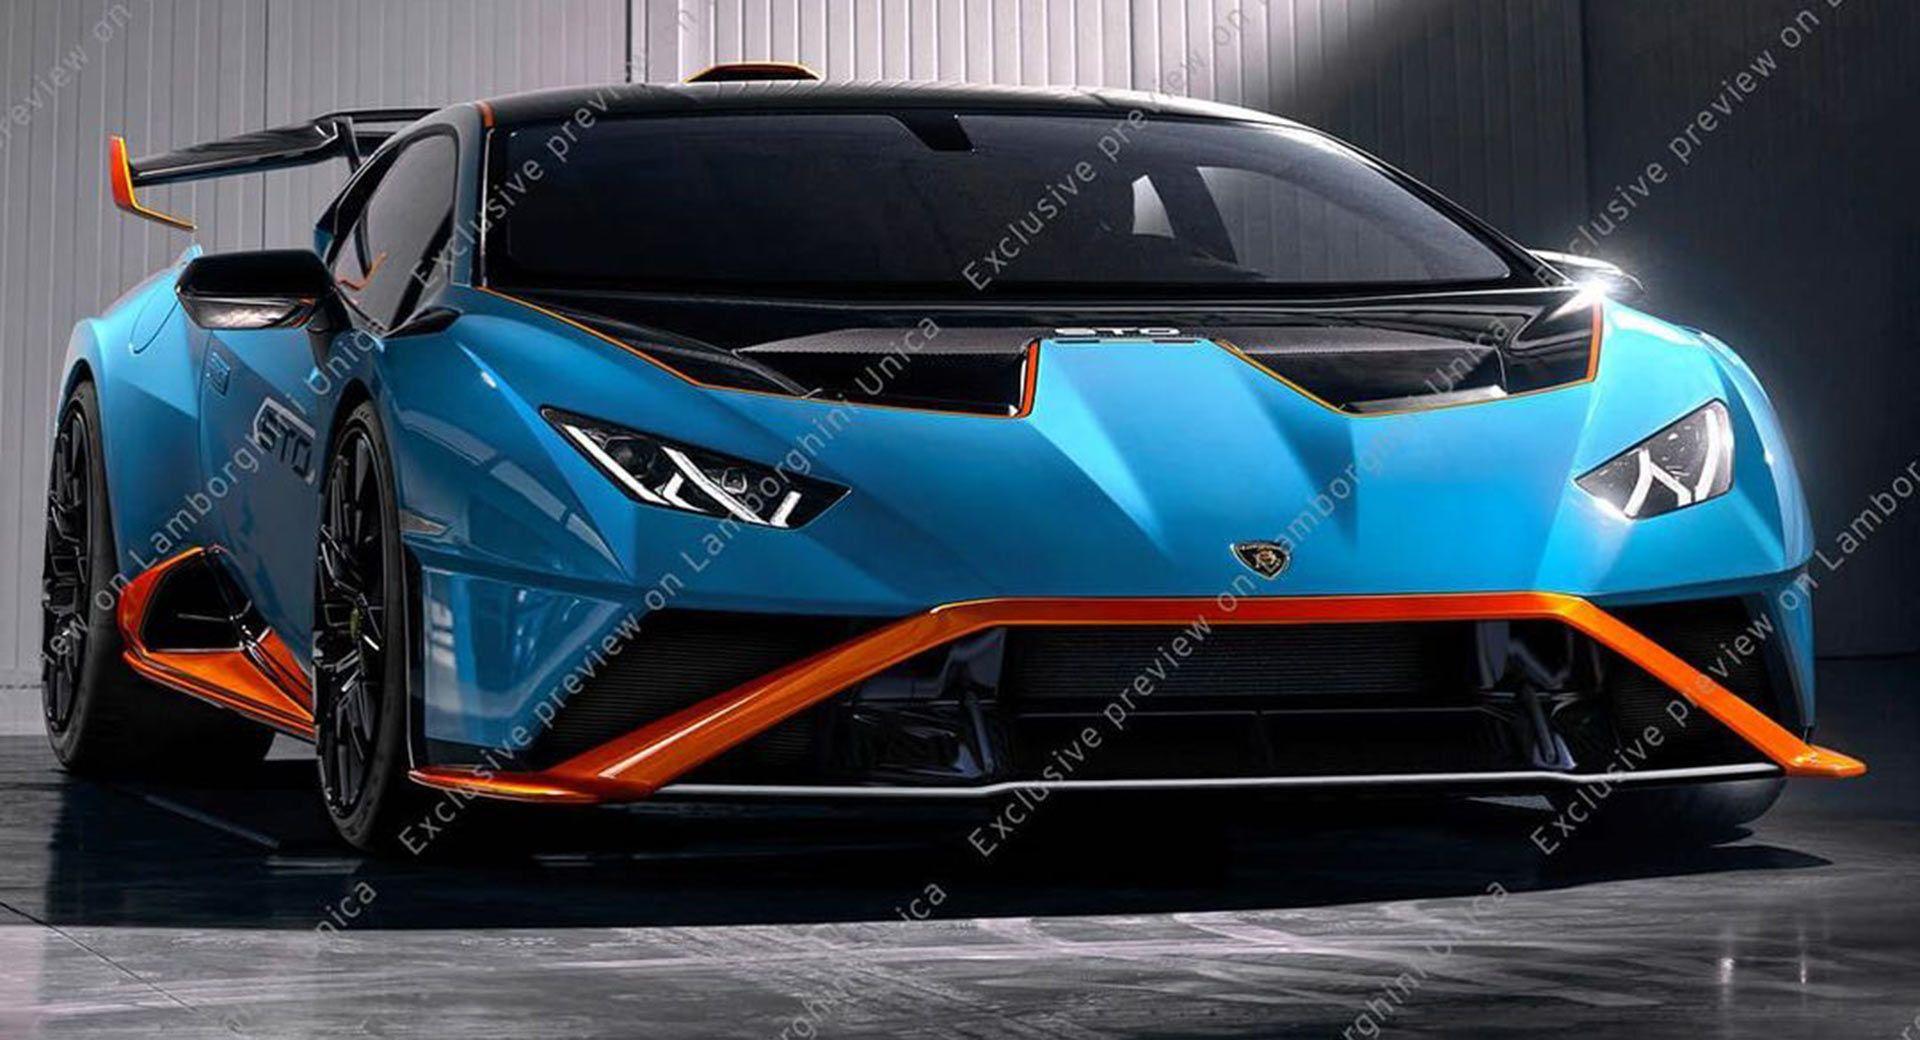 Prior Design Wants To Rewrite History With Audi Rs2 Coupe Widebody Kit Lamborghini Huracan Lamborghini Police Lamborghini